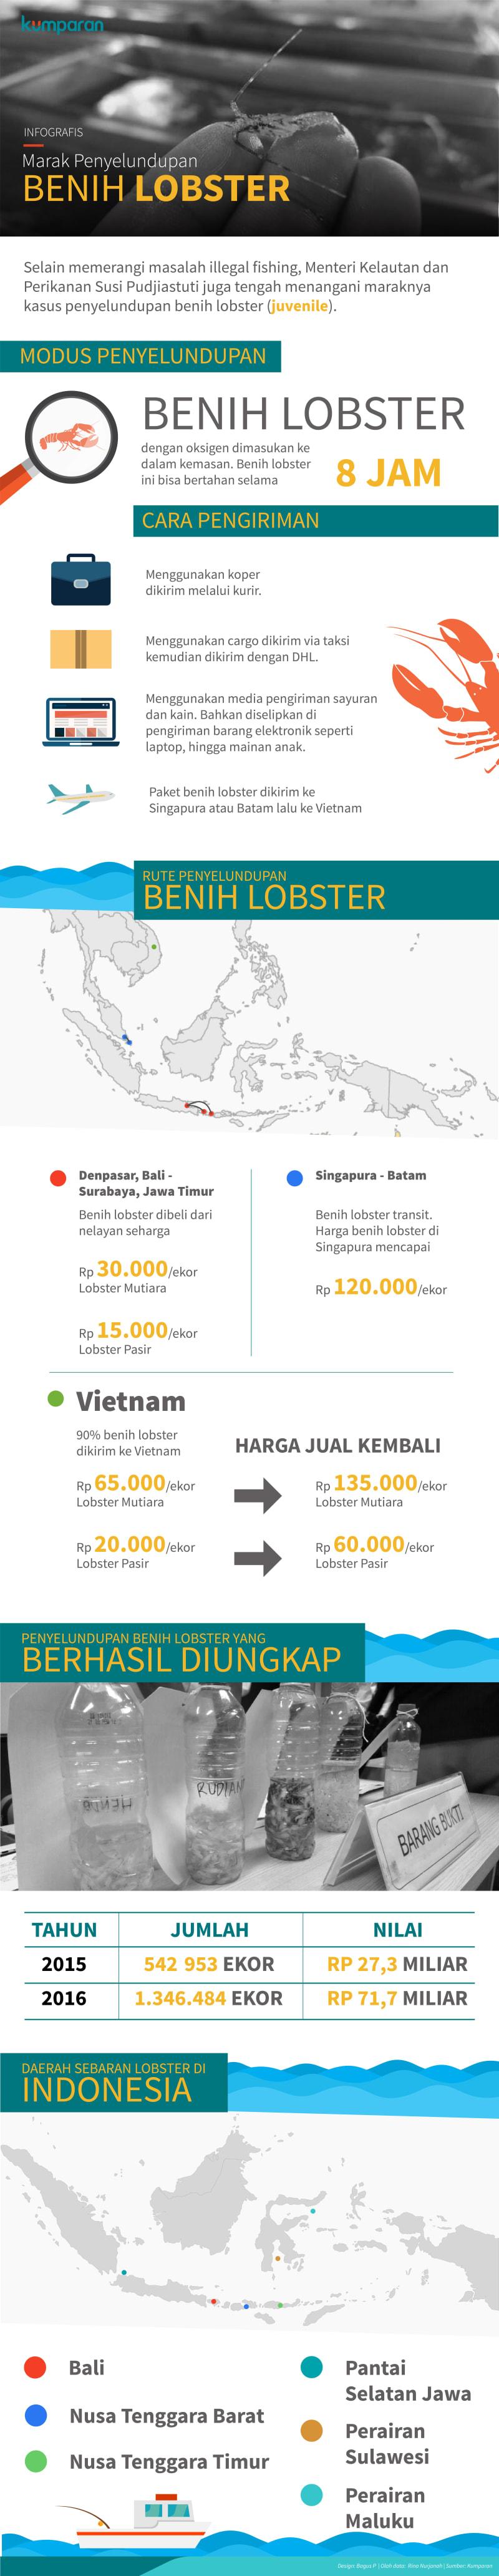 Infografis Penyelundupan Lobster